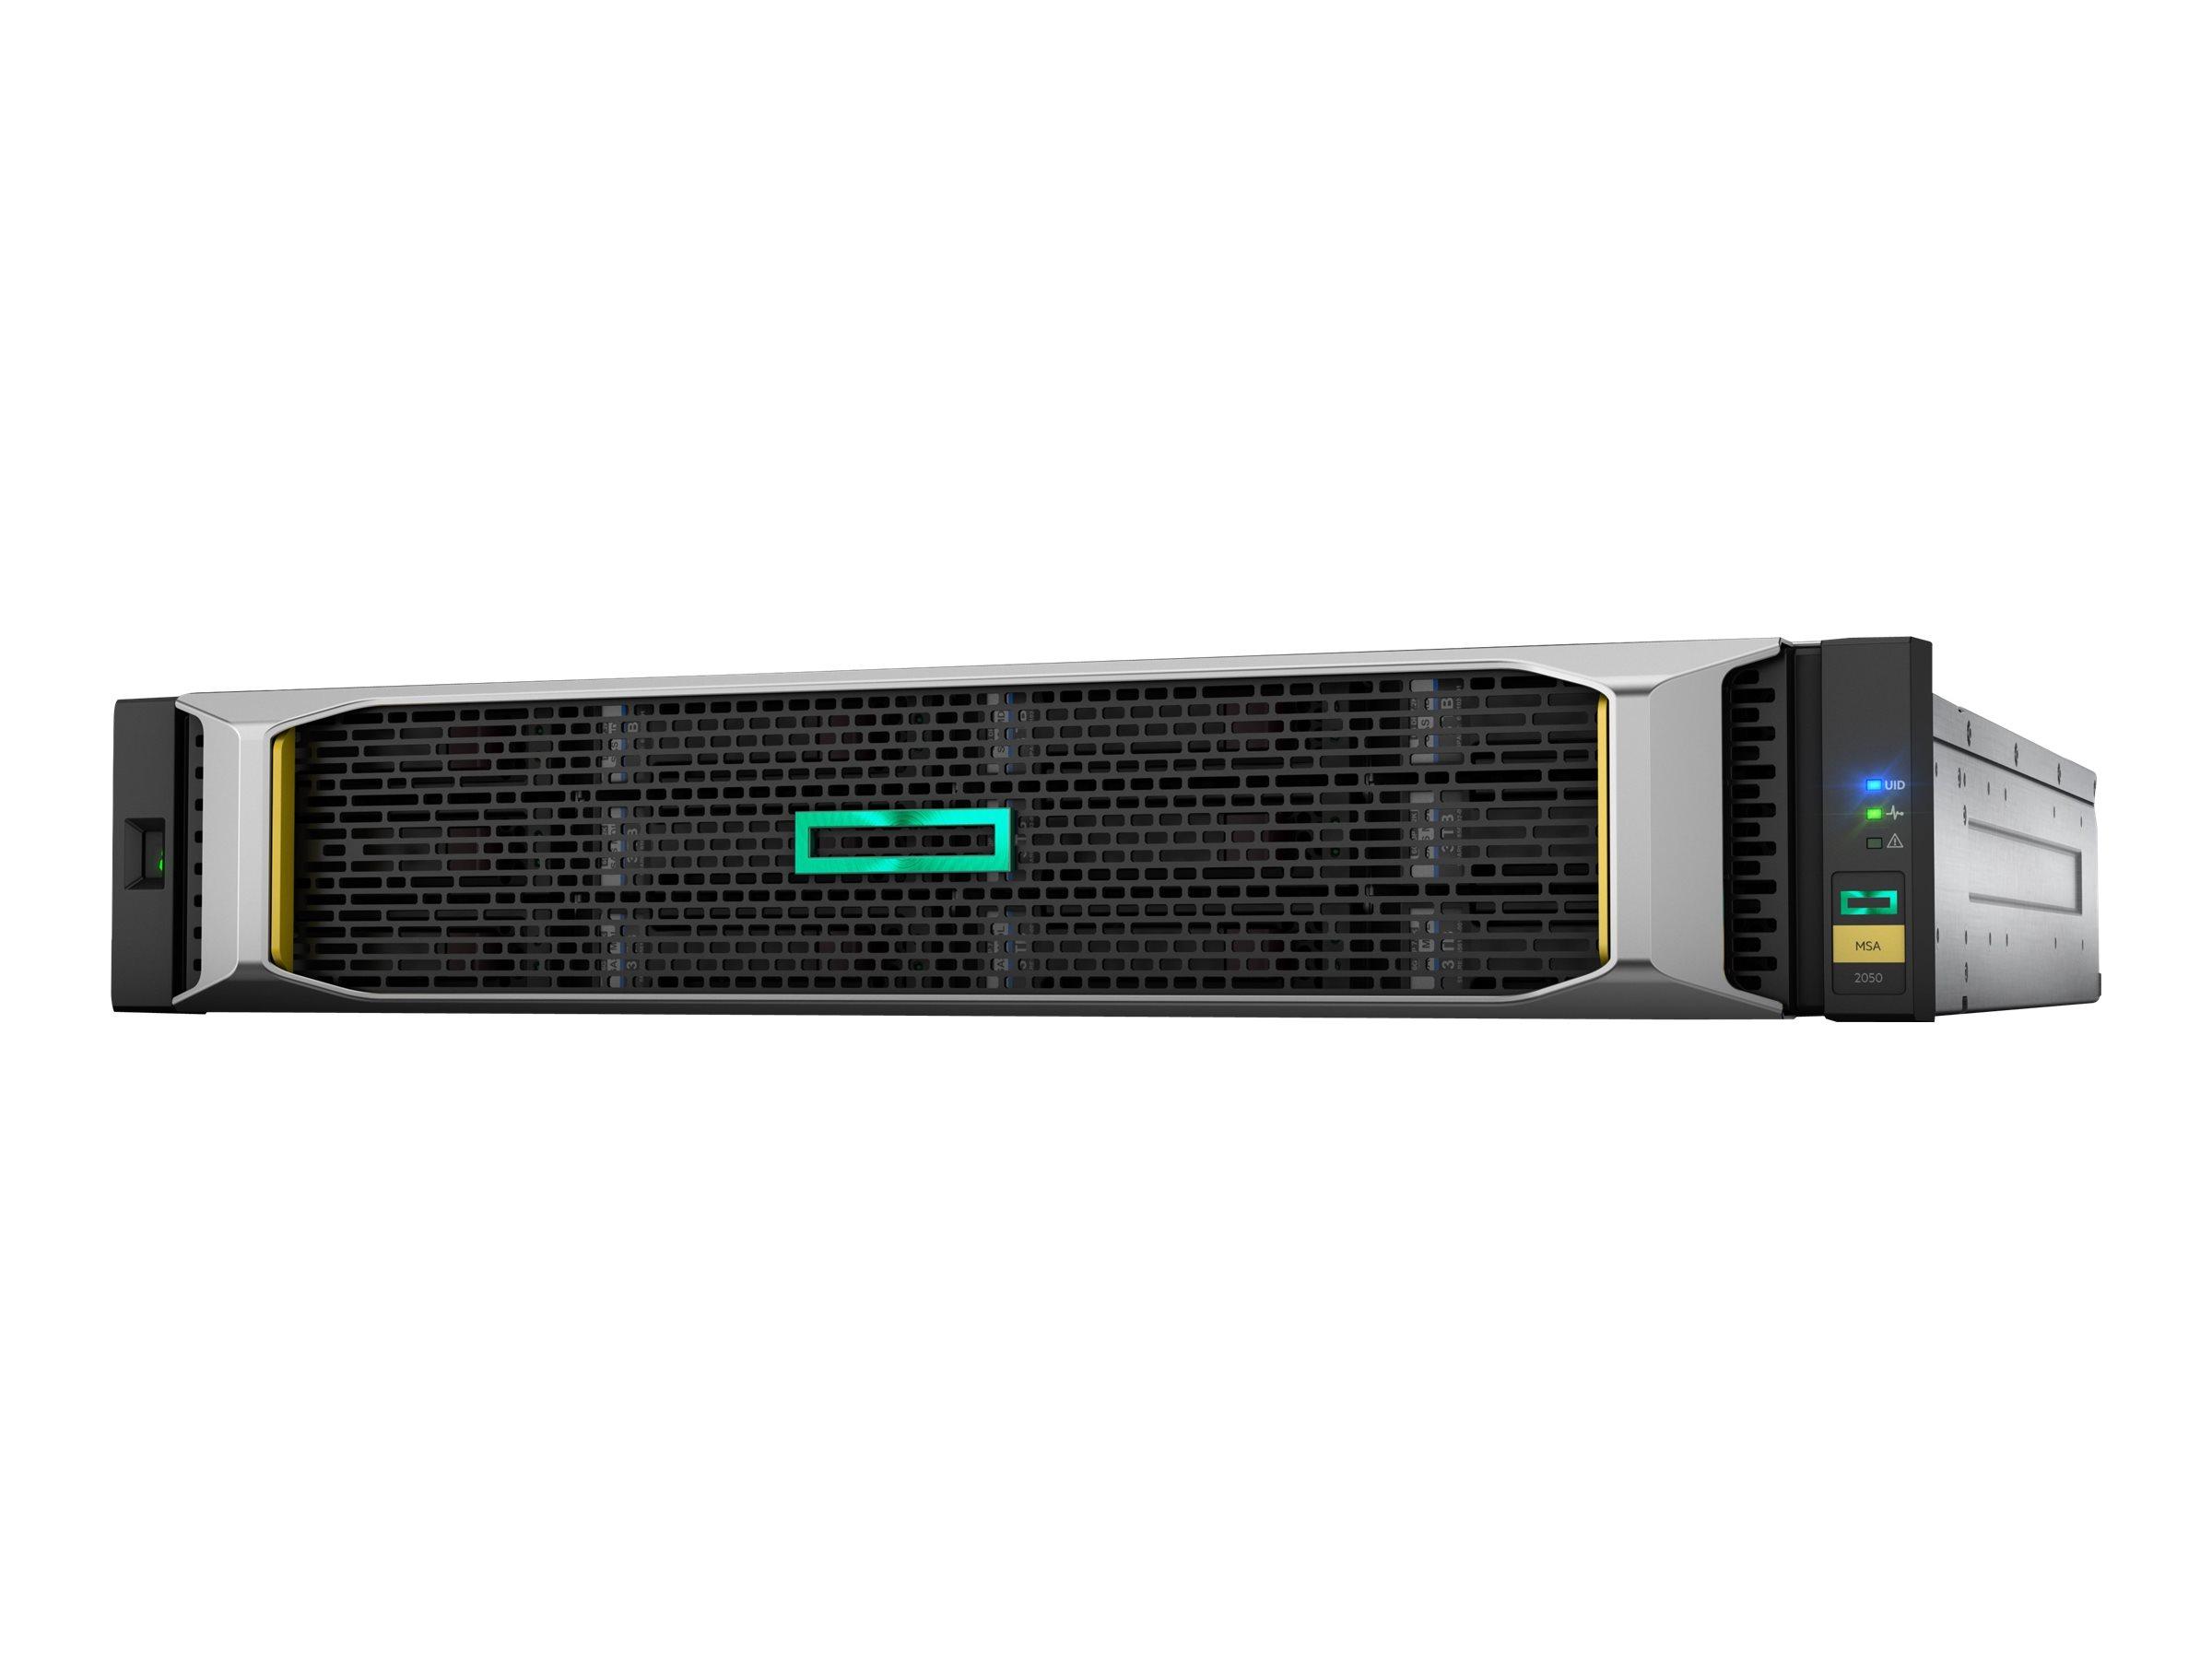 HPE Modular Smart Array 2050 SAN Dual Controller LFF Storage - Festplatten-Array - 12 Schächte (SAS-2) - Rack - einbaufähig - 2U